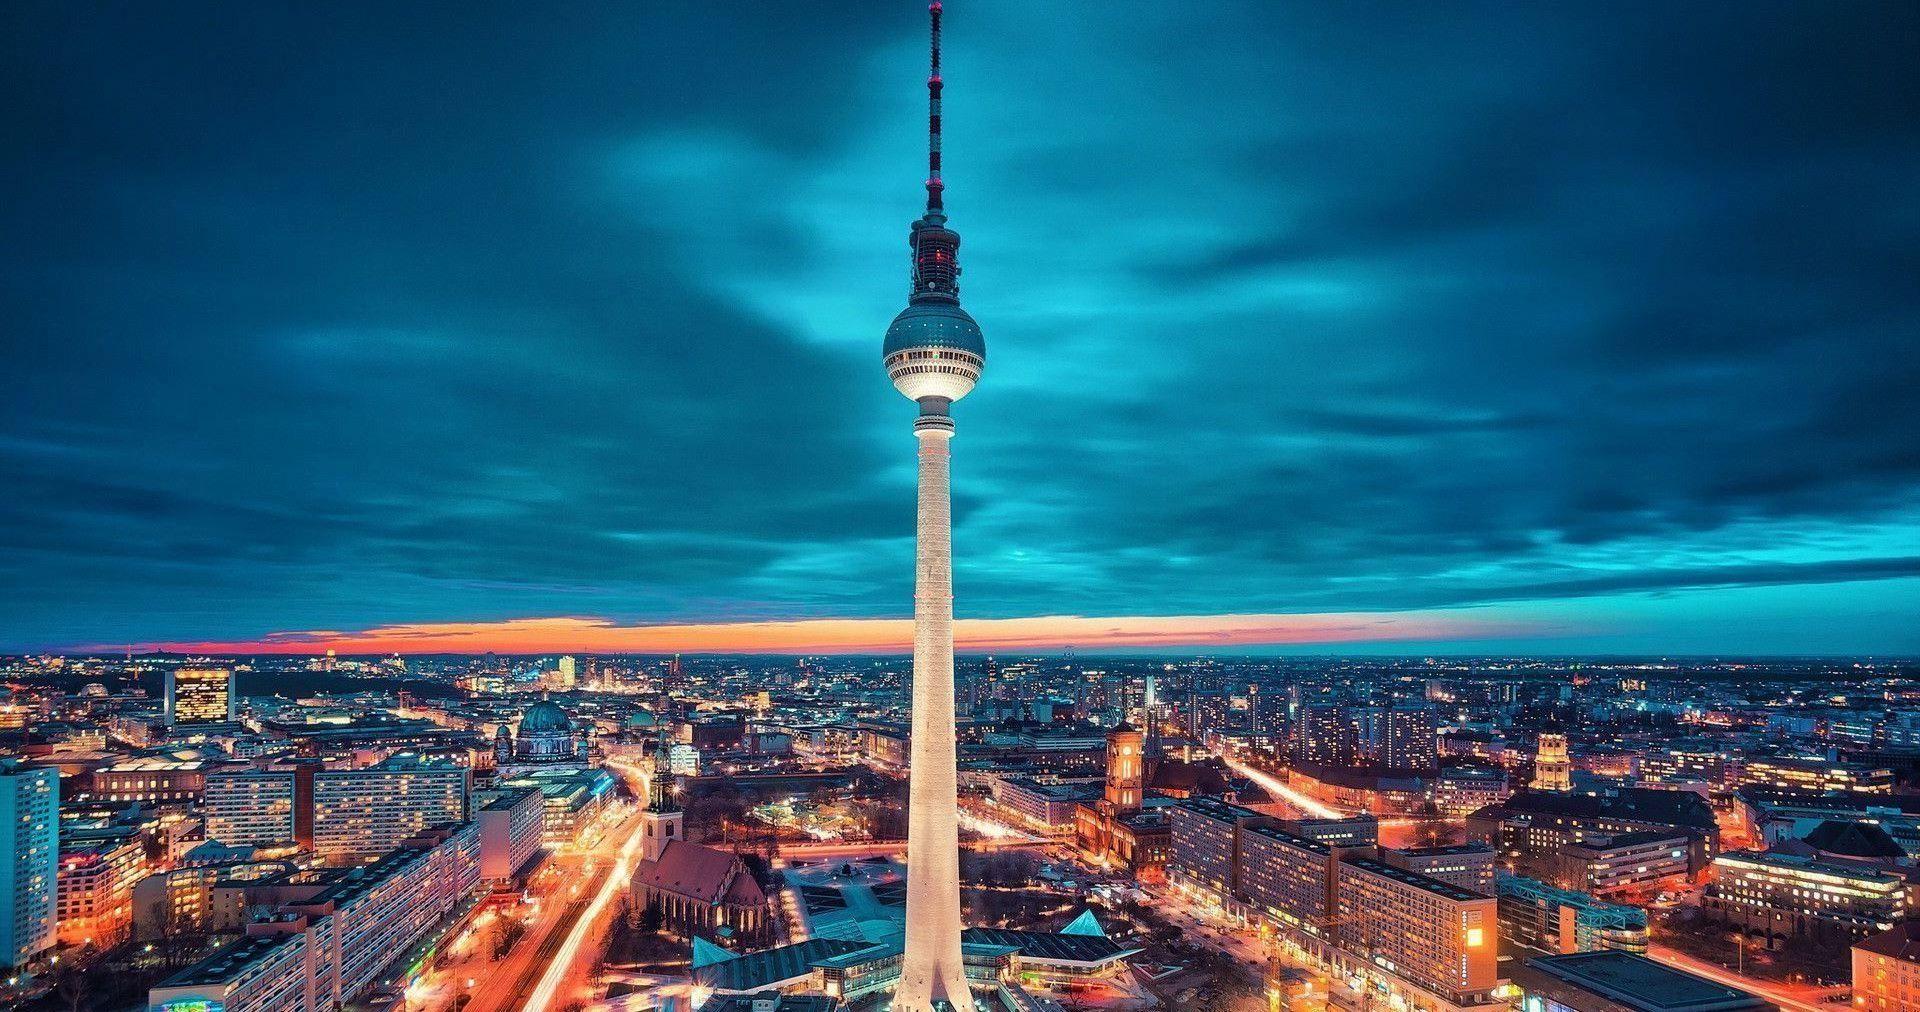 Berliner Fernsehturm In Love In The Last Days Of Renaissance Berlin Travel Berlin City Berlin